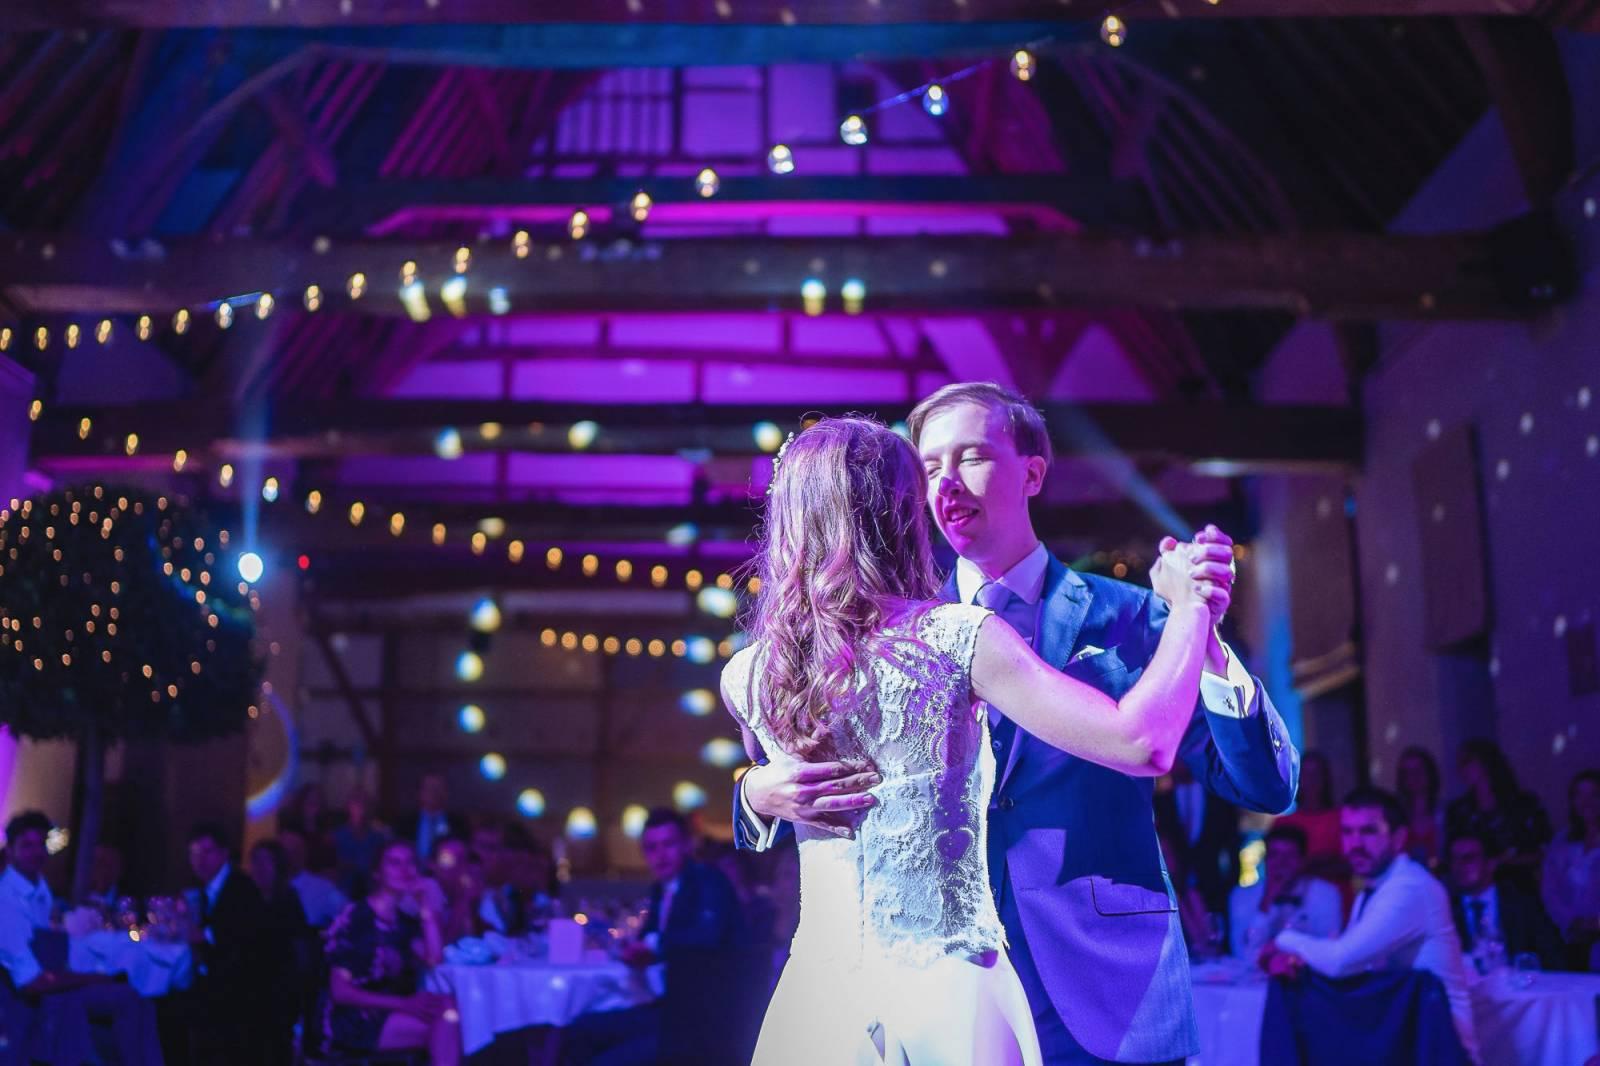 Alex VDB - House of Weddings - 15